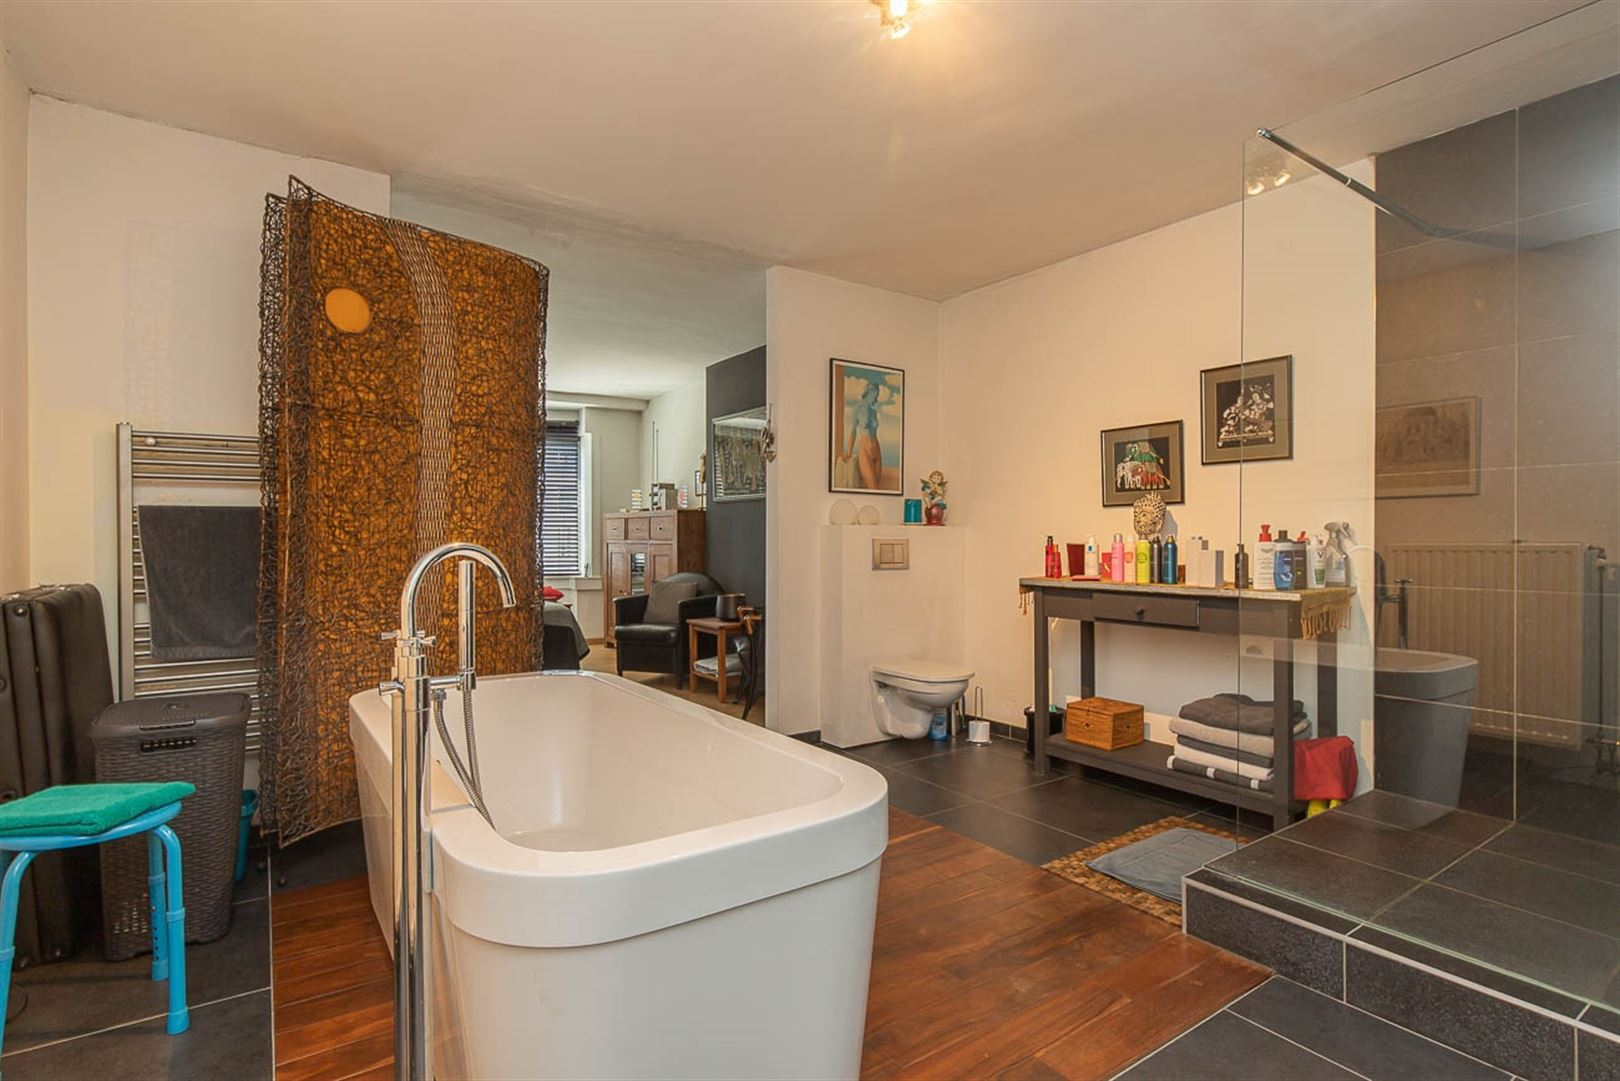 Foto 23 : Duplex/triplex te 9200 DENDERMONDE (België) - Prijs € 495.000